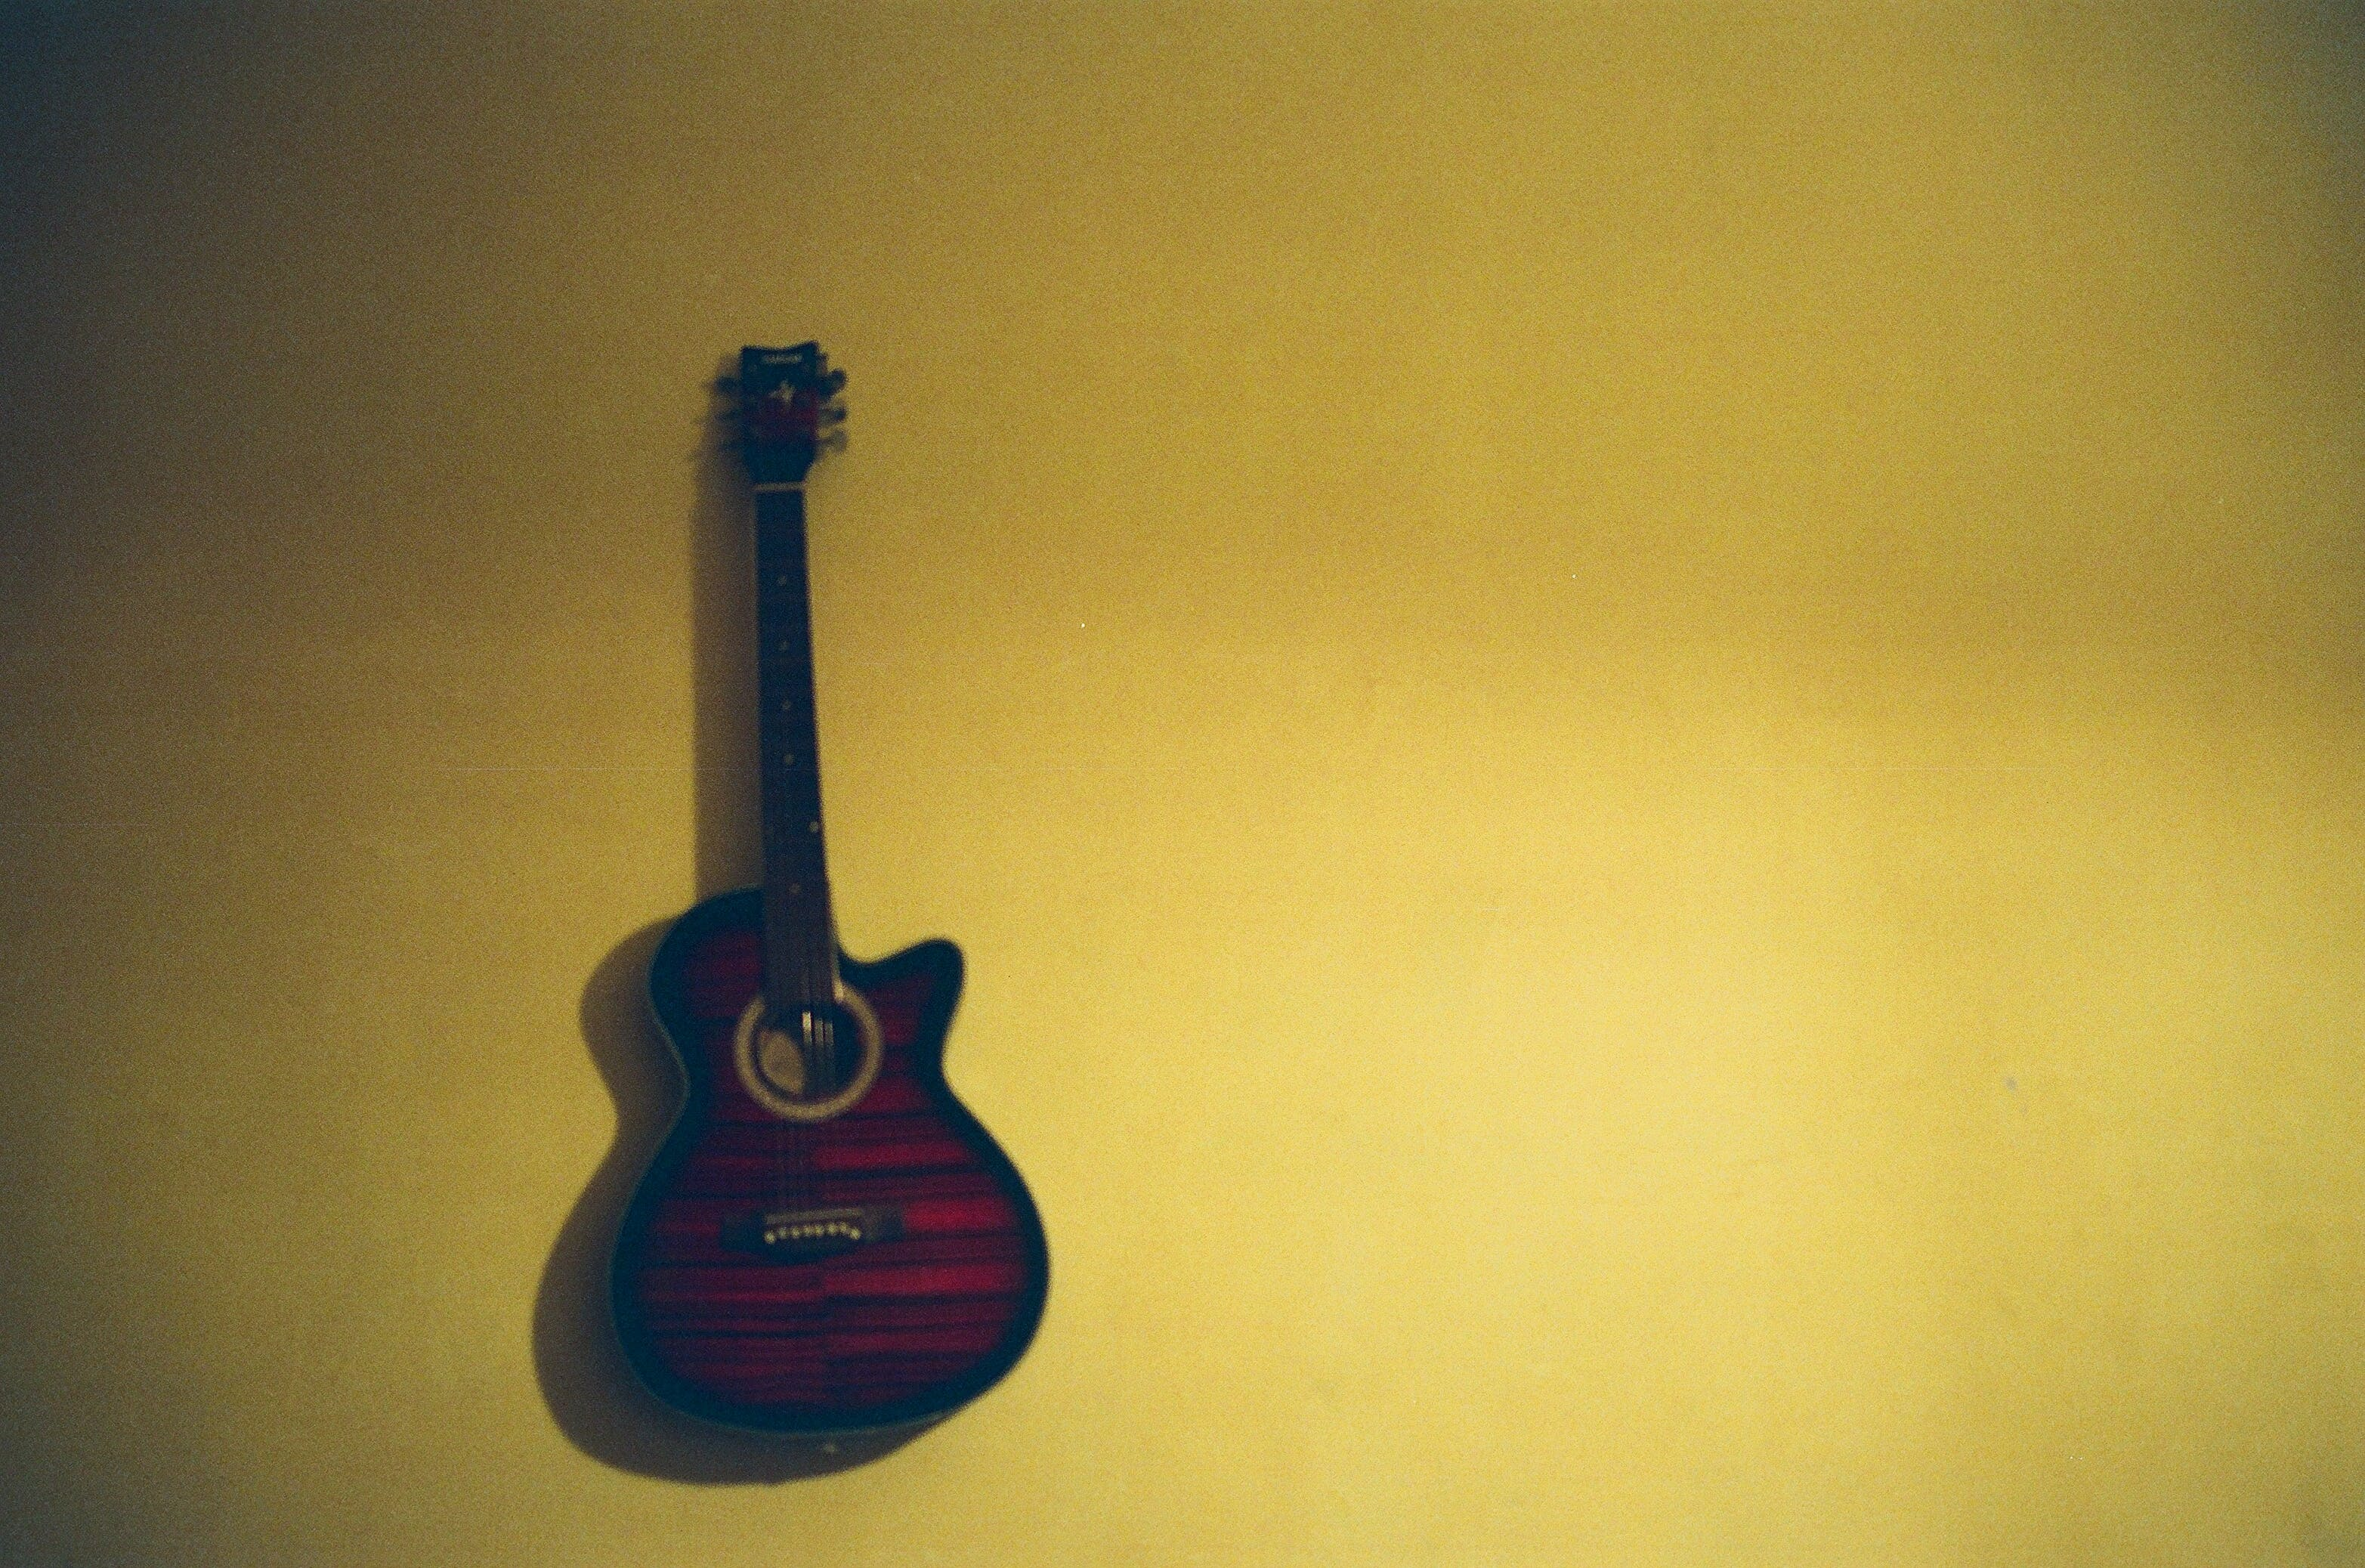 Free stock photo of acoustic guitar, analog camera, film camera, FM10